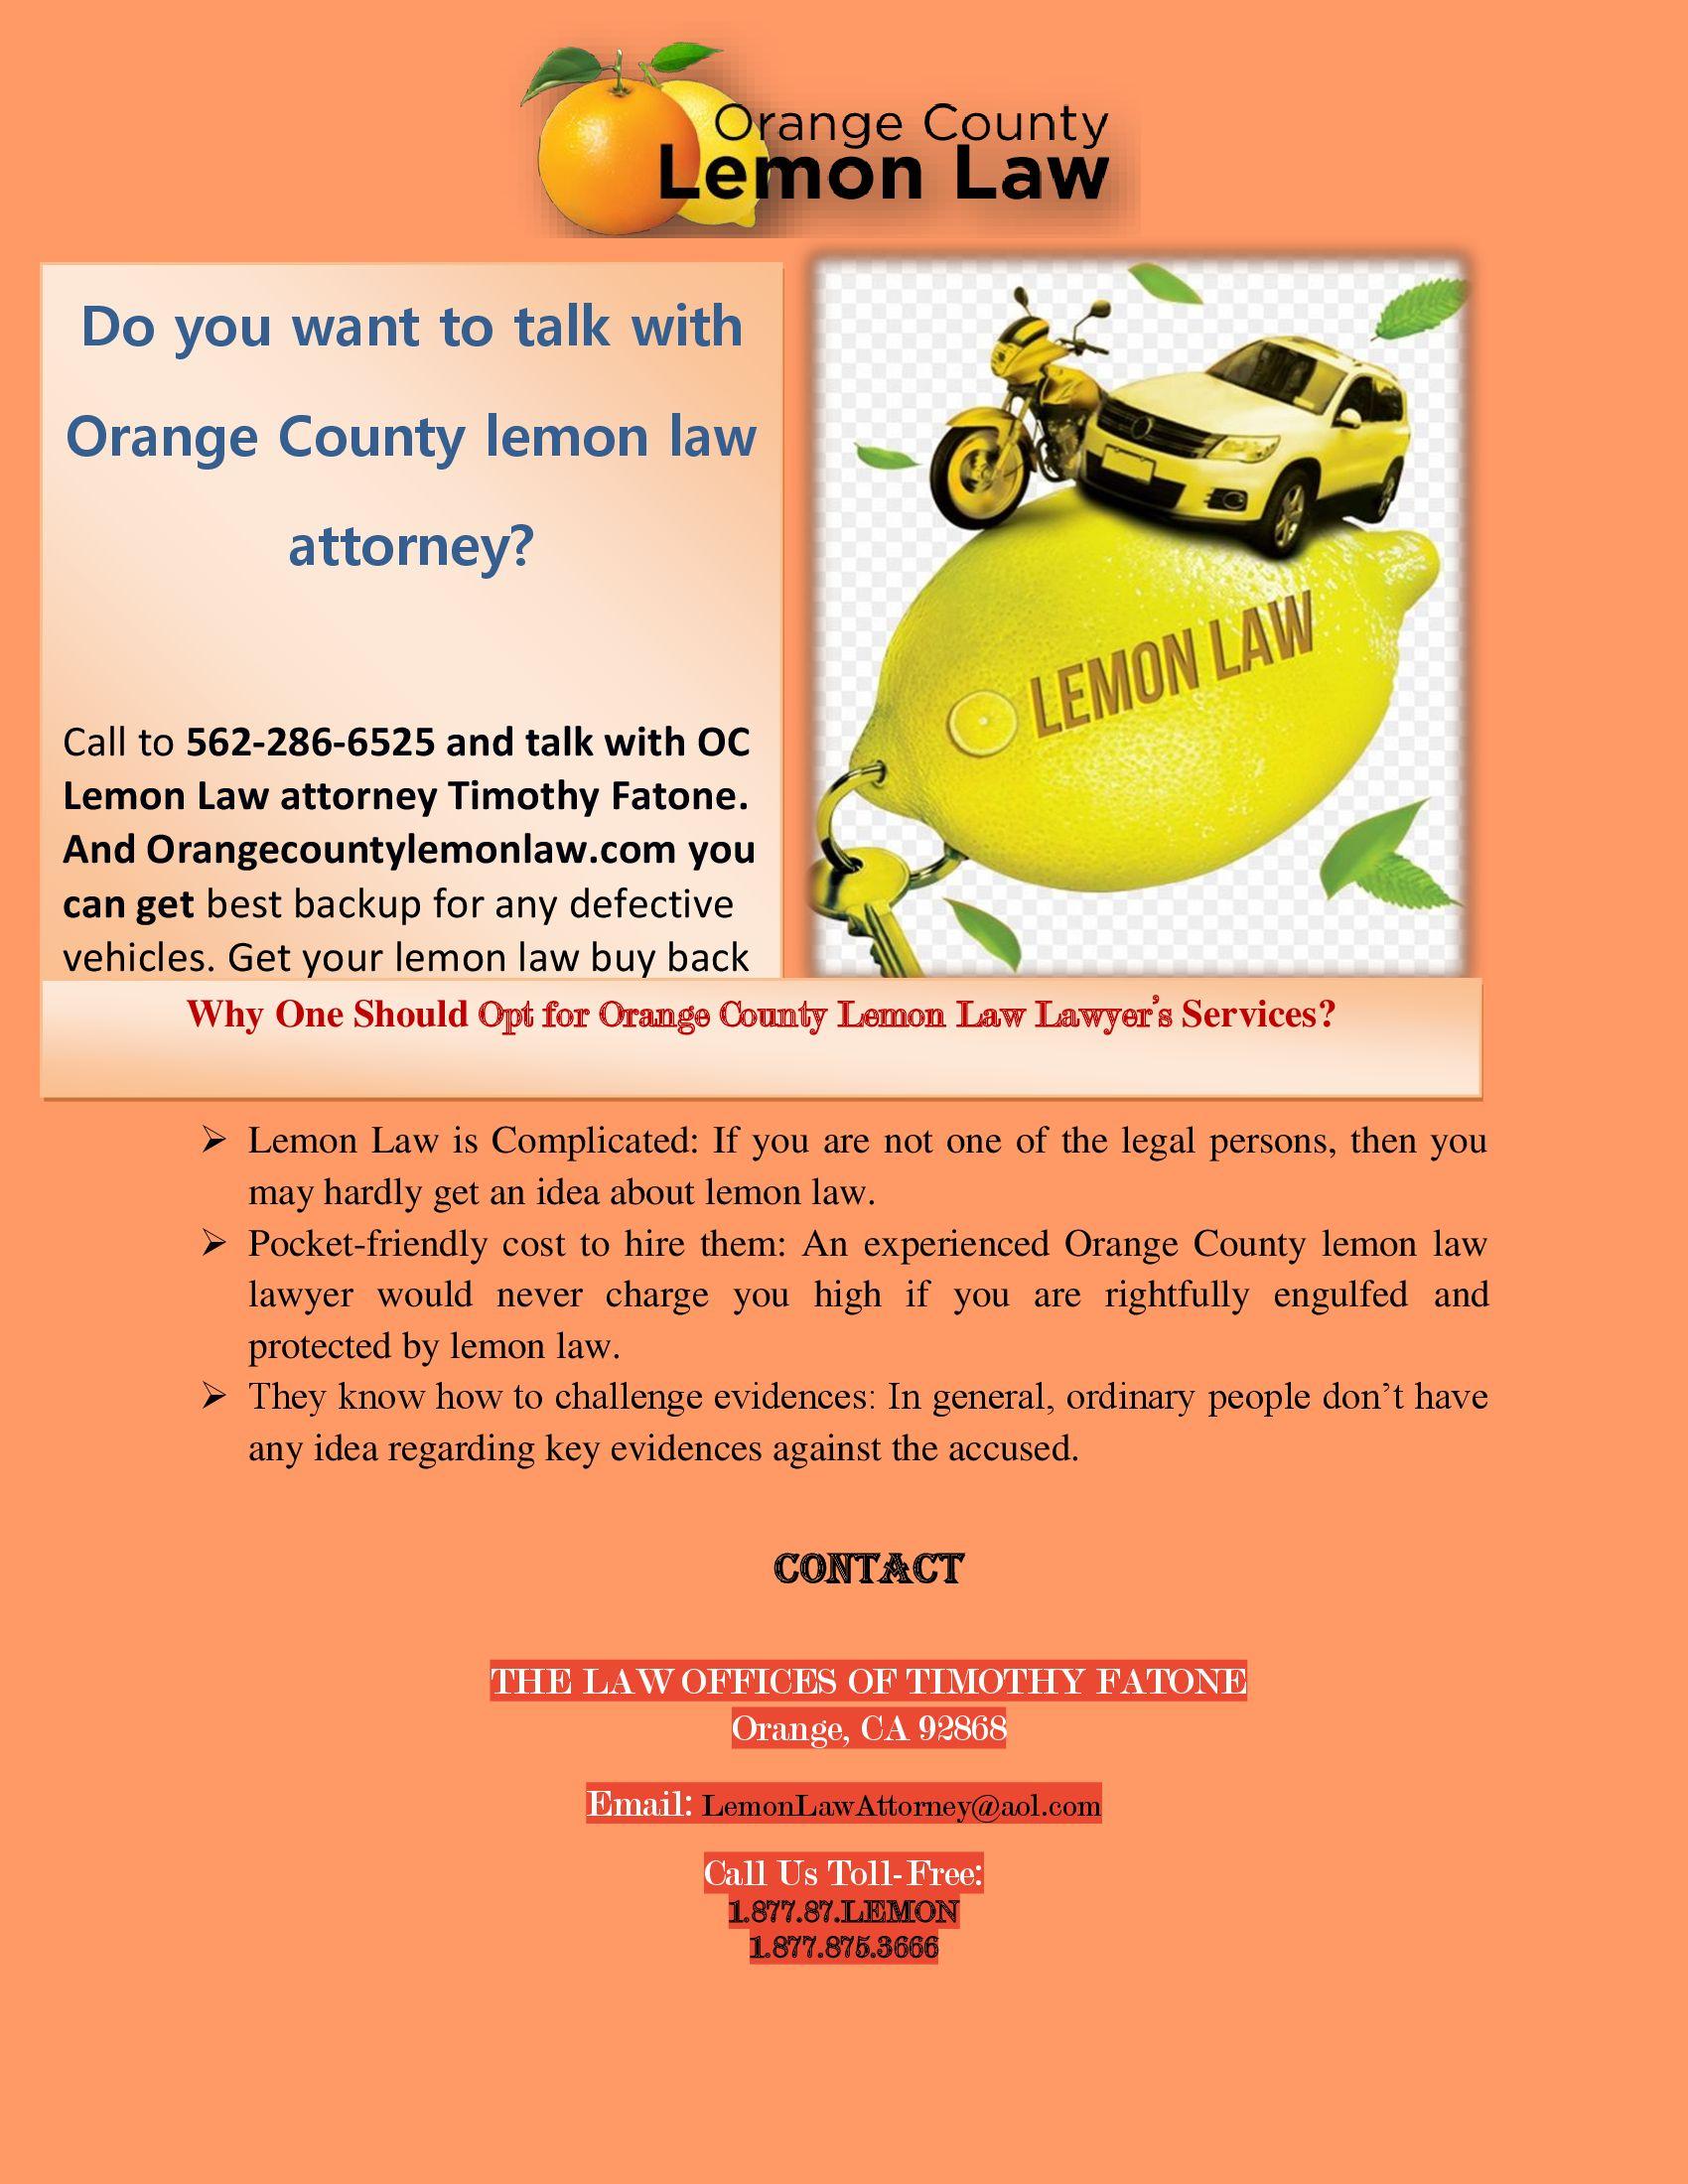 Orange County Lemon Law – Lemon lawyers for your Cars in California